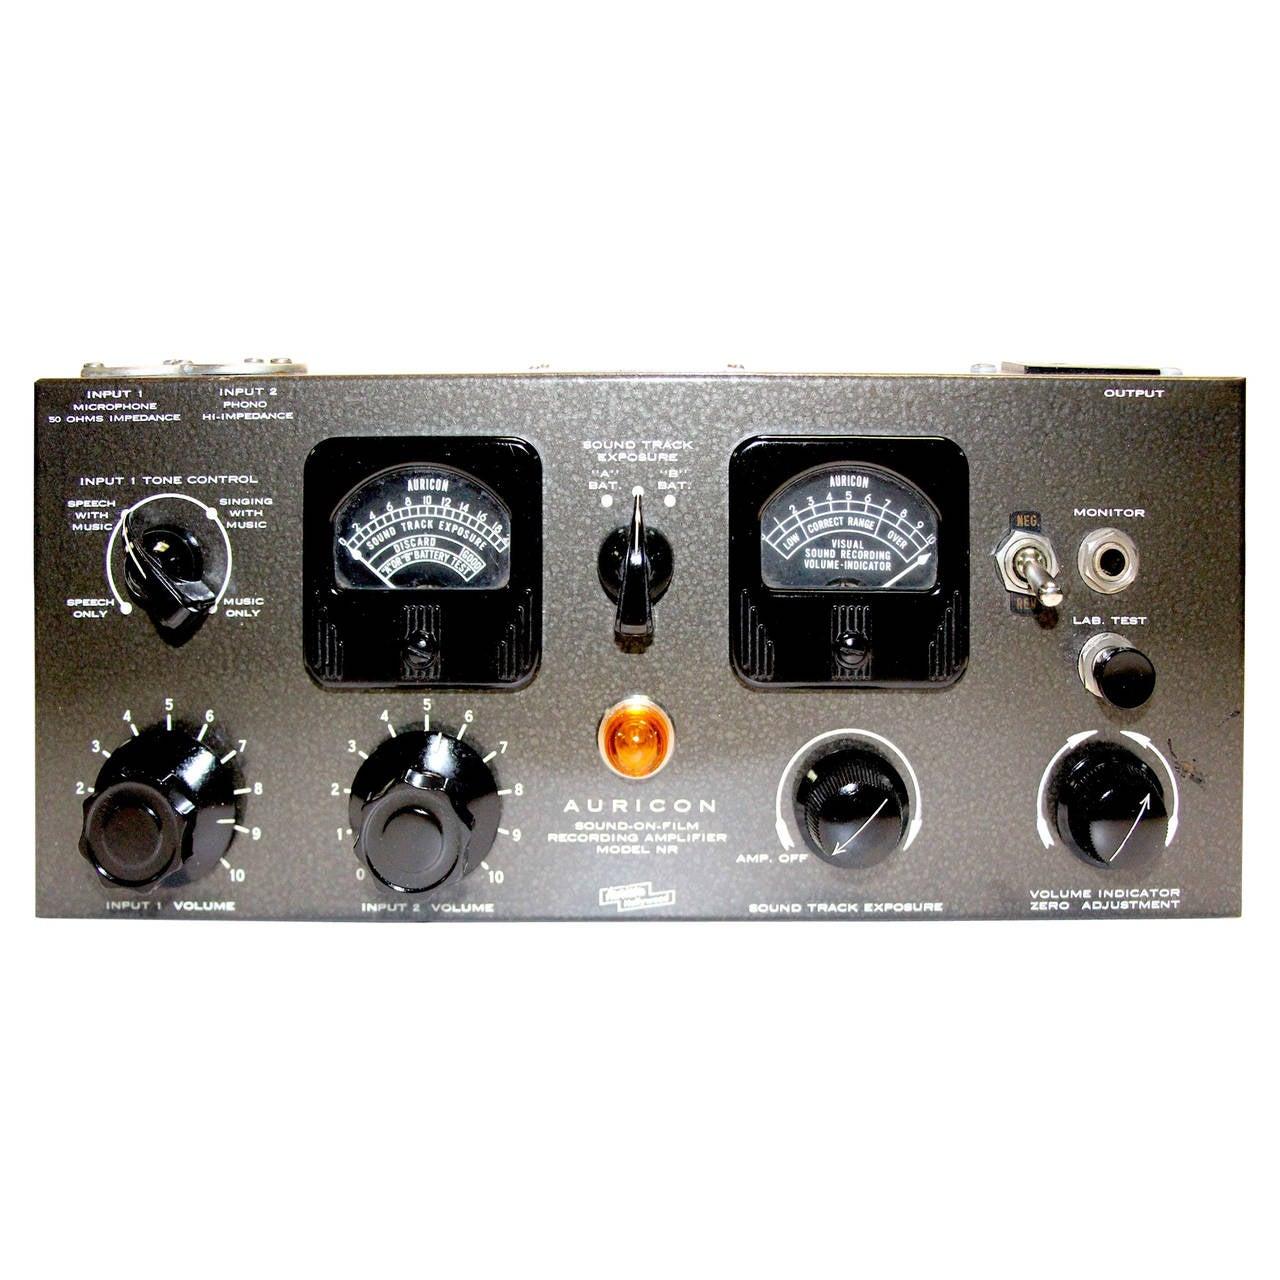 Auricon Sound on Film Optical Sound Recording Cinema Amplifier NR-24, Circa 1949